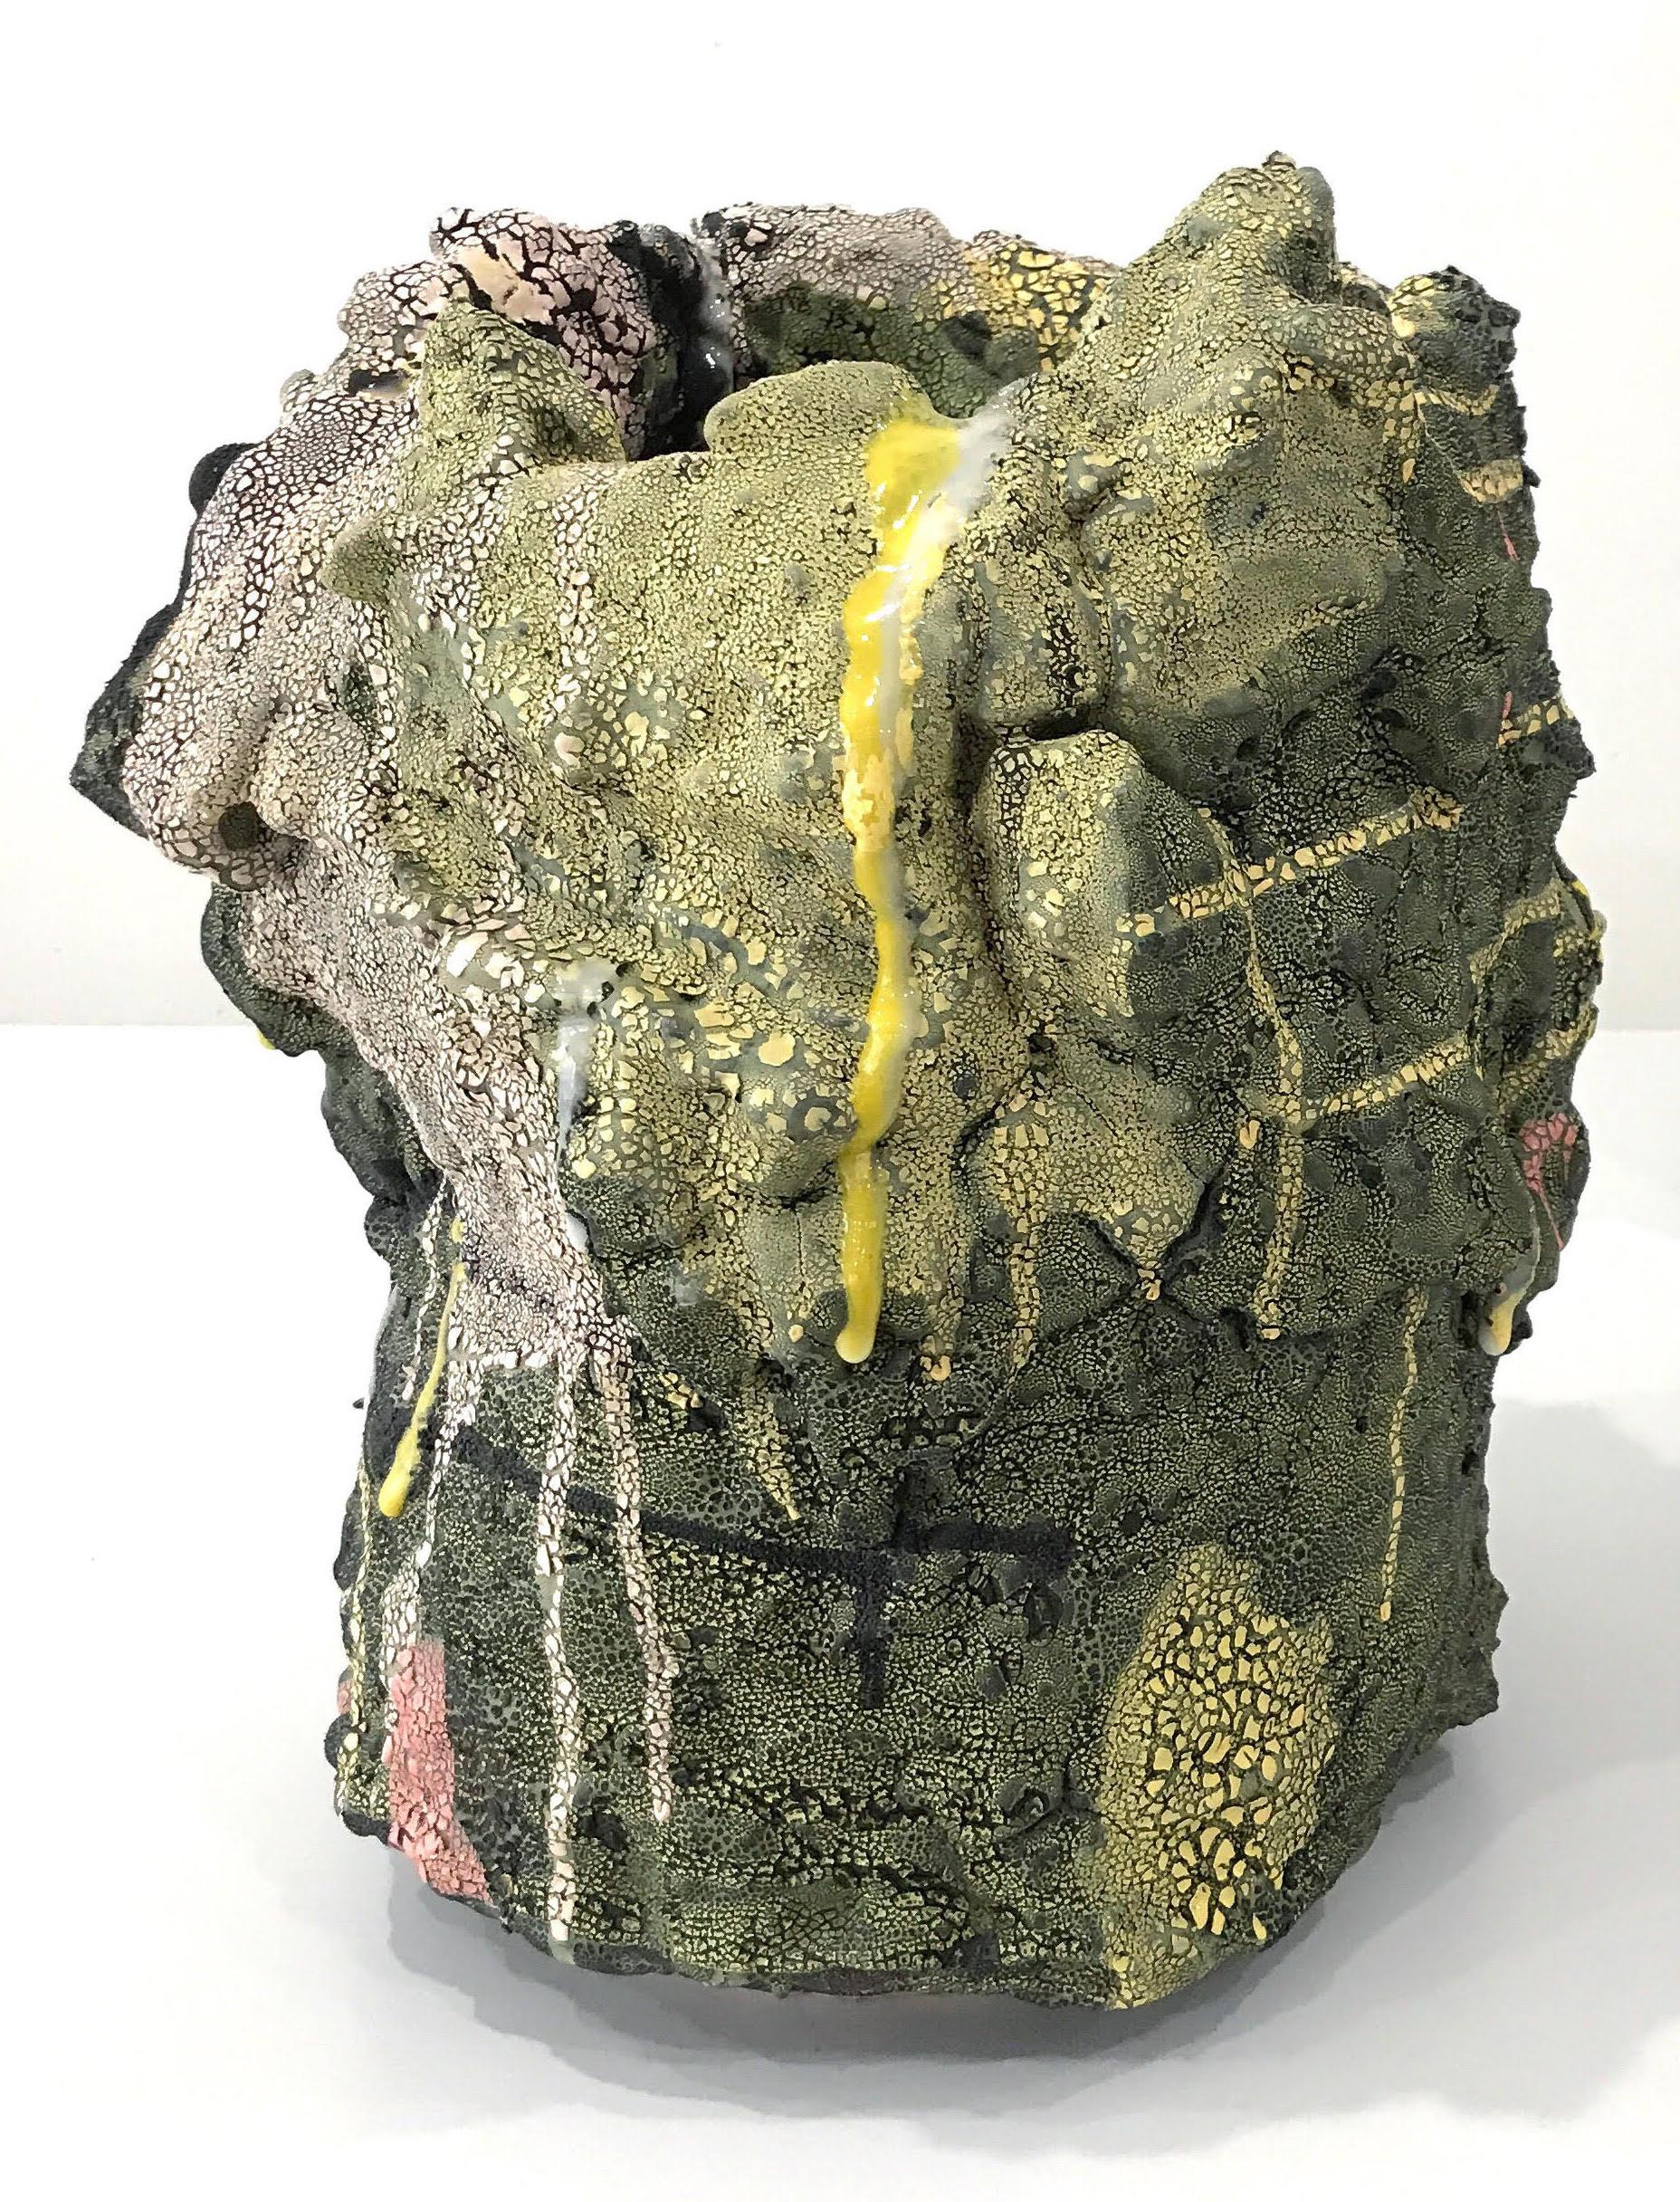 Brian Rochefort  Vessel 234,  2017 ceramic, glaze 16 x 15 x 15 in.